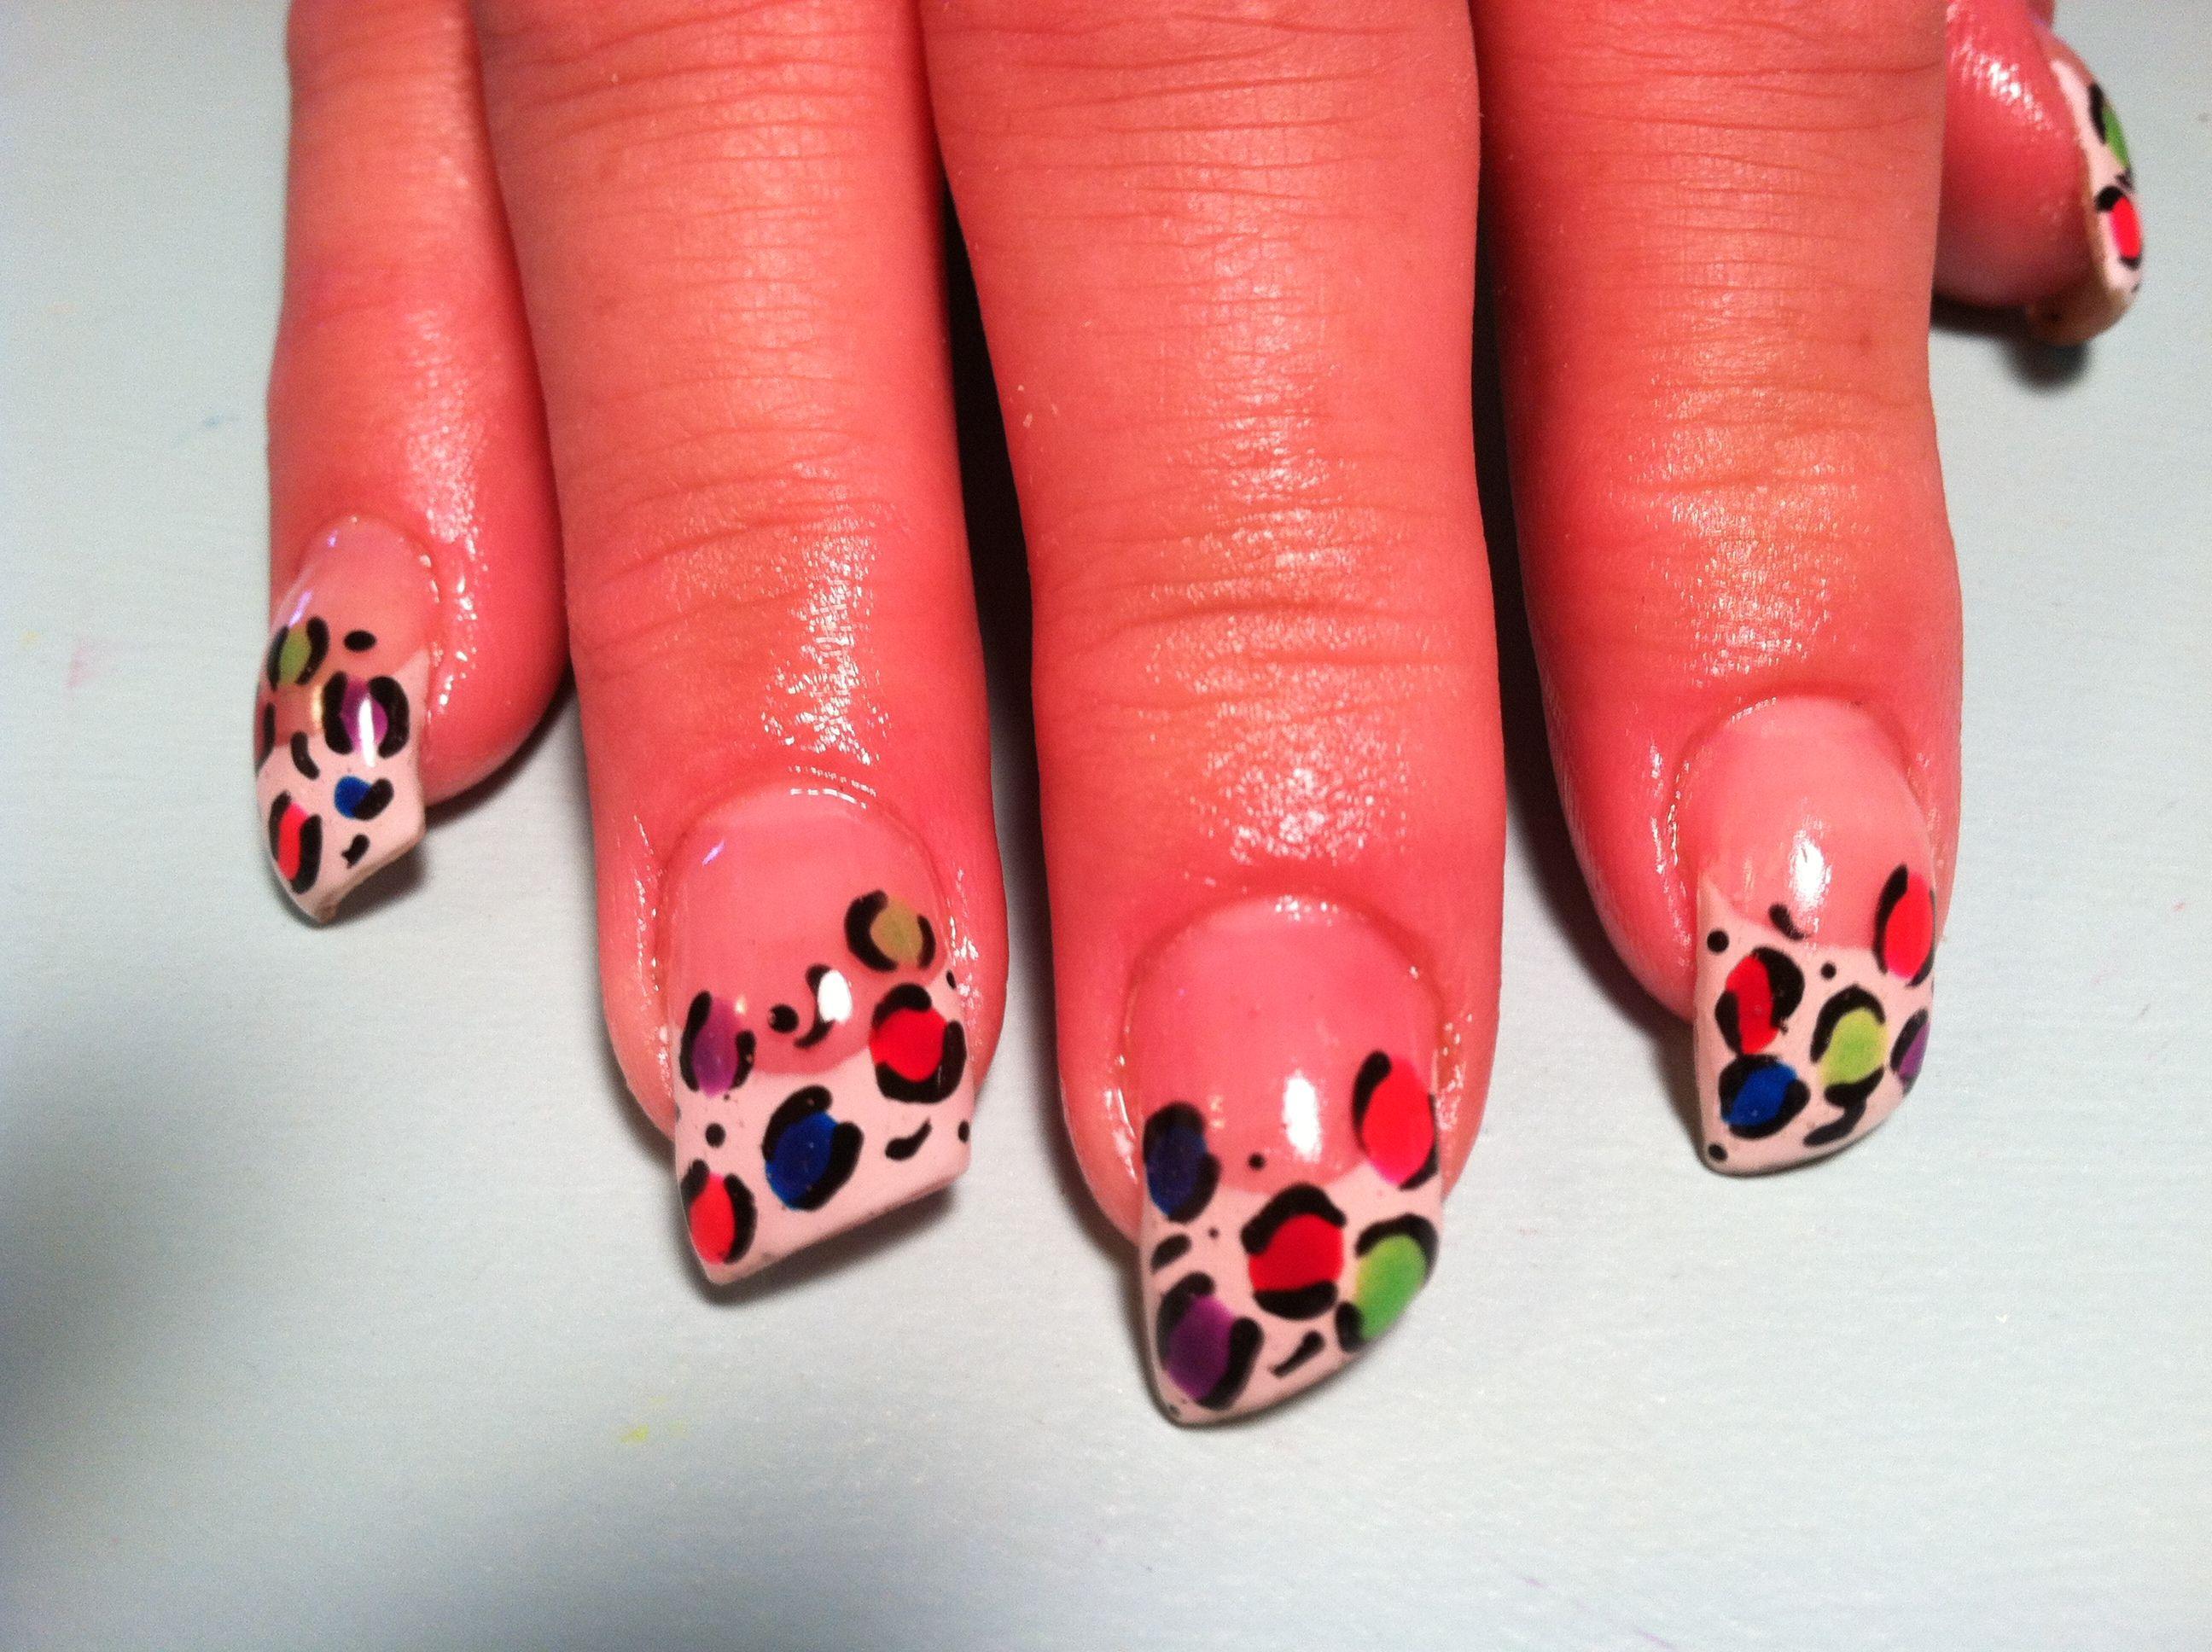 Lipstick cut Rainbow Cheetah!!! | Nails by Melissa | Pinterest ...